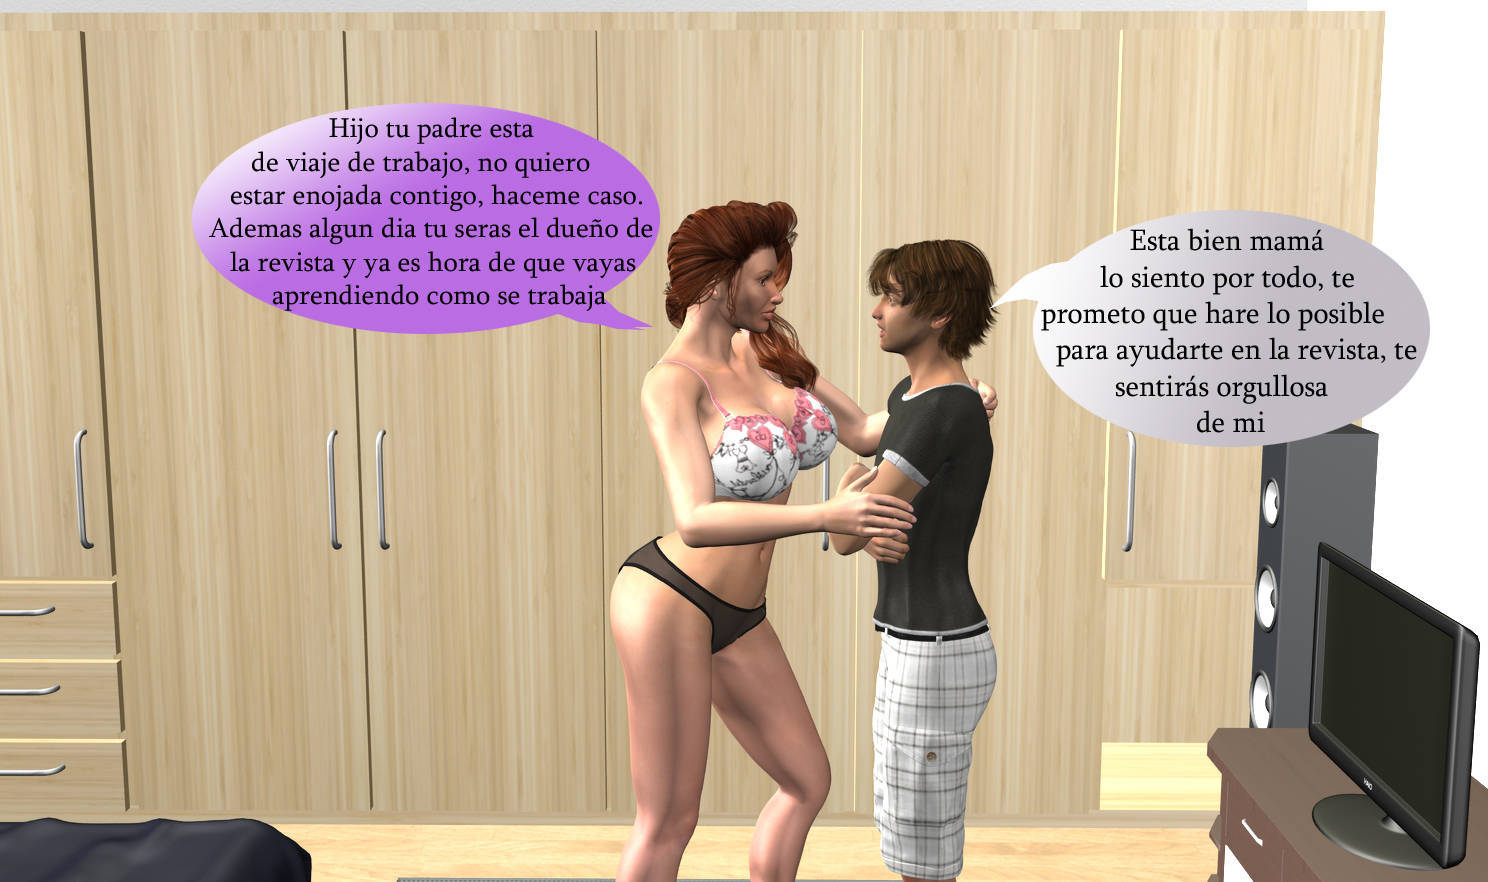 Aprendiendo Porno cosas que pasan,3d incest (spanish) ~ ver porno xxx comics